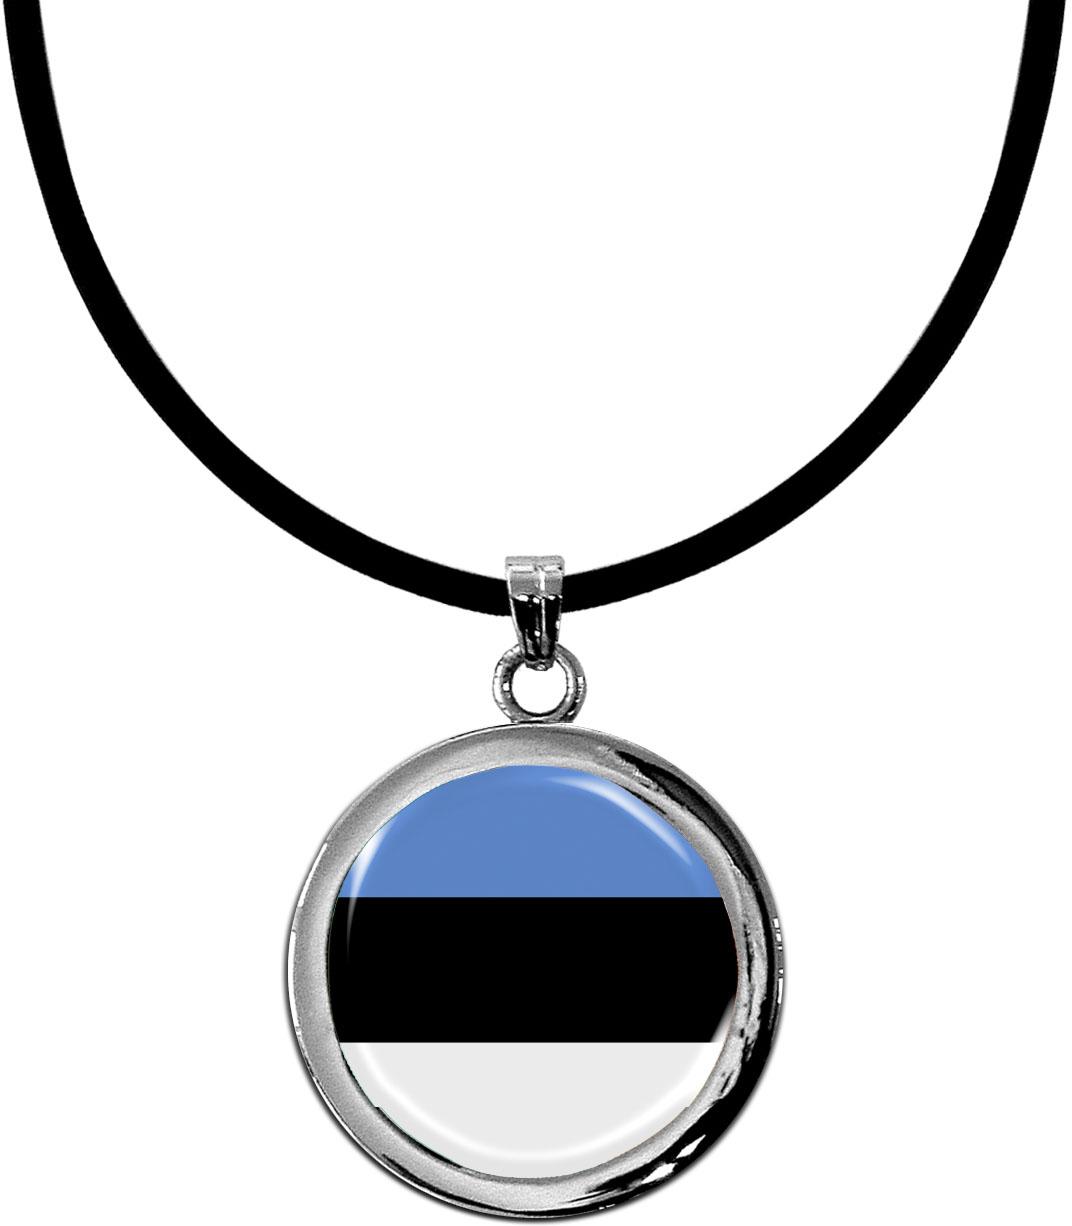 Kettenanhänger / Estland / Silikonband mit Silberverschluss